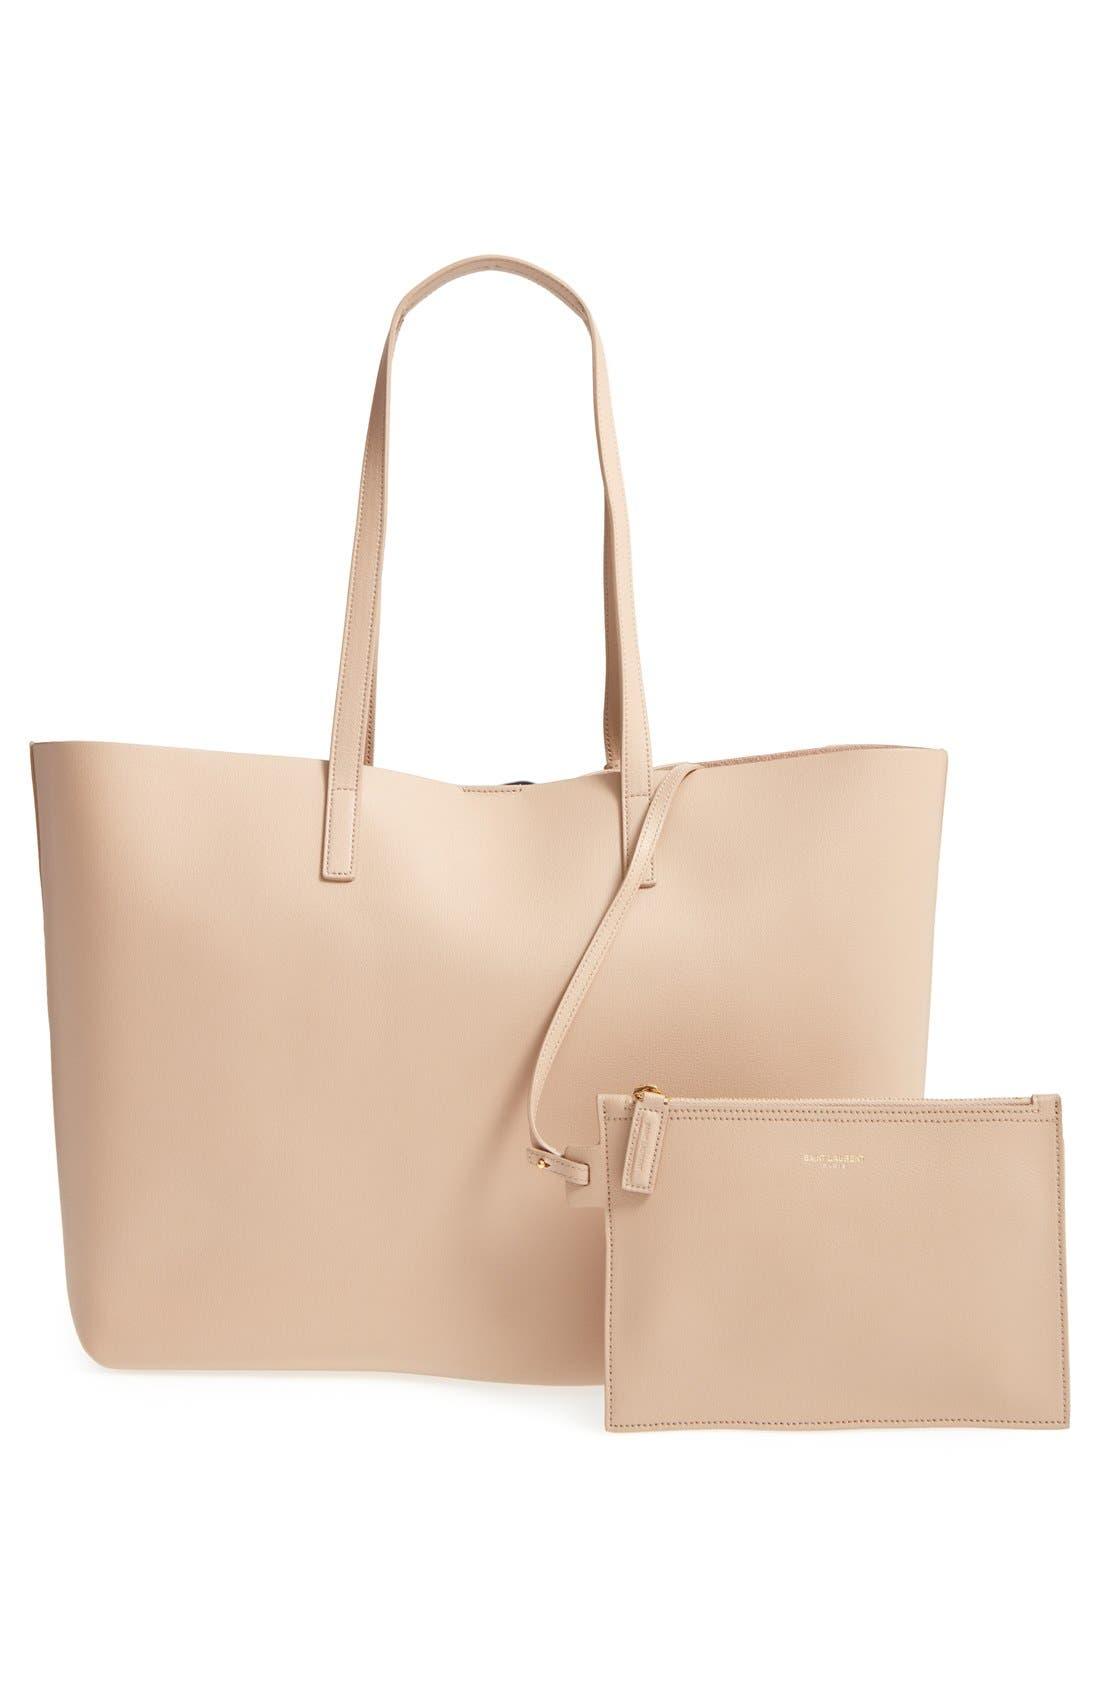 Alternate Image 3  - Saint Laurent 'Shopping' Leather Tote